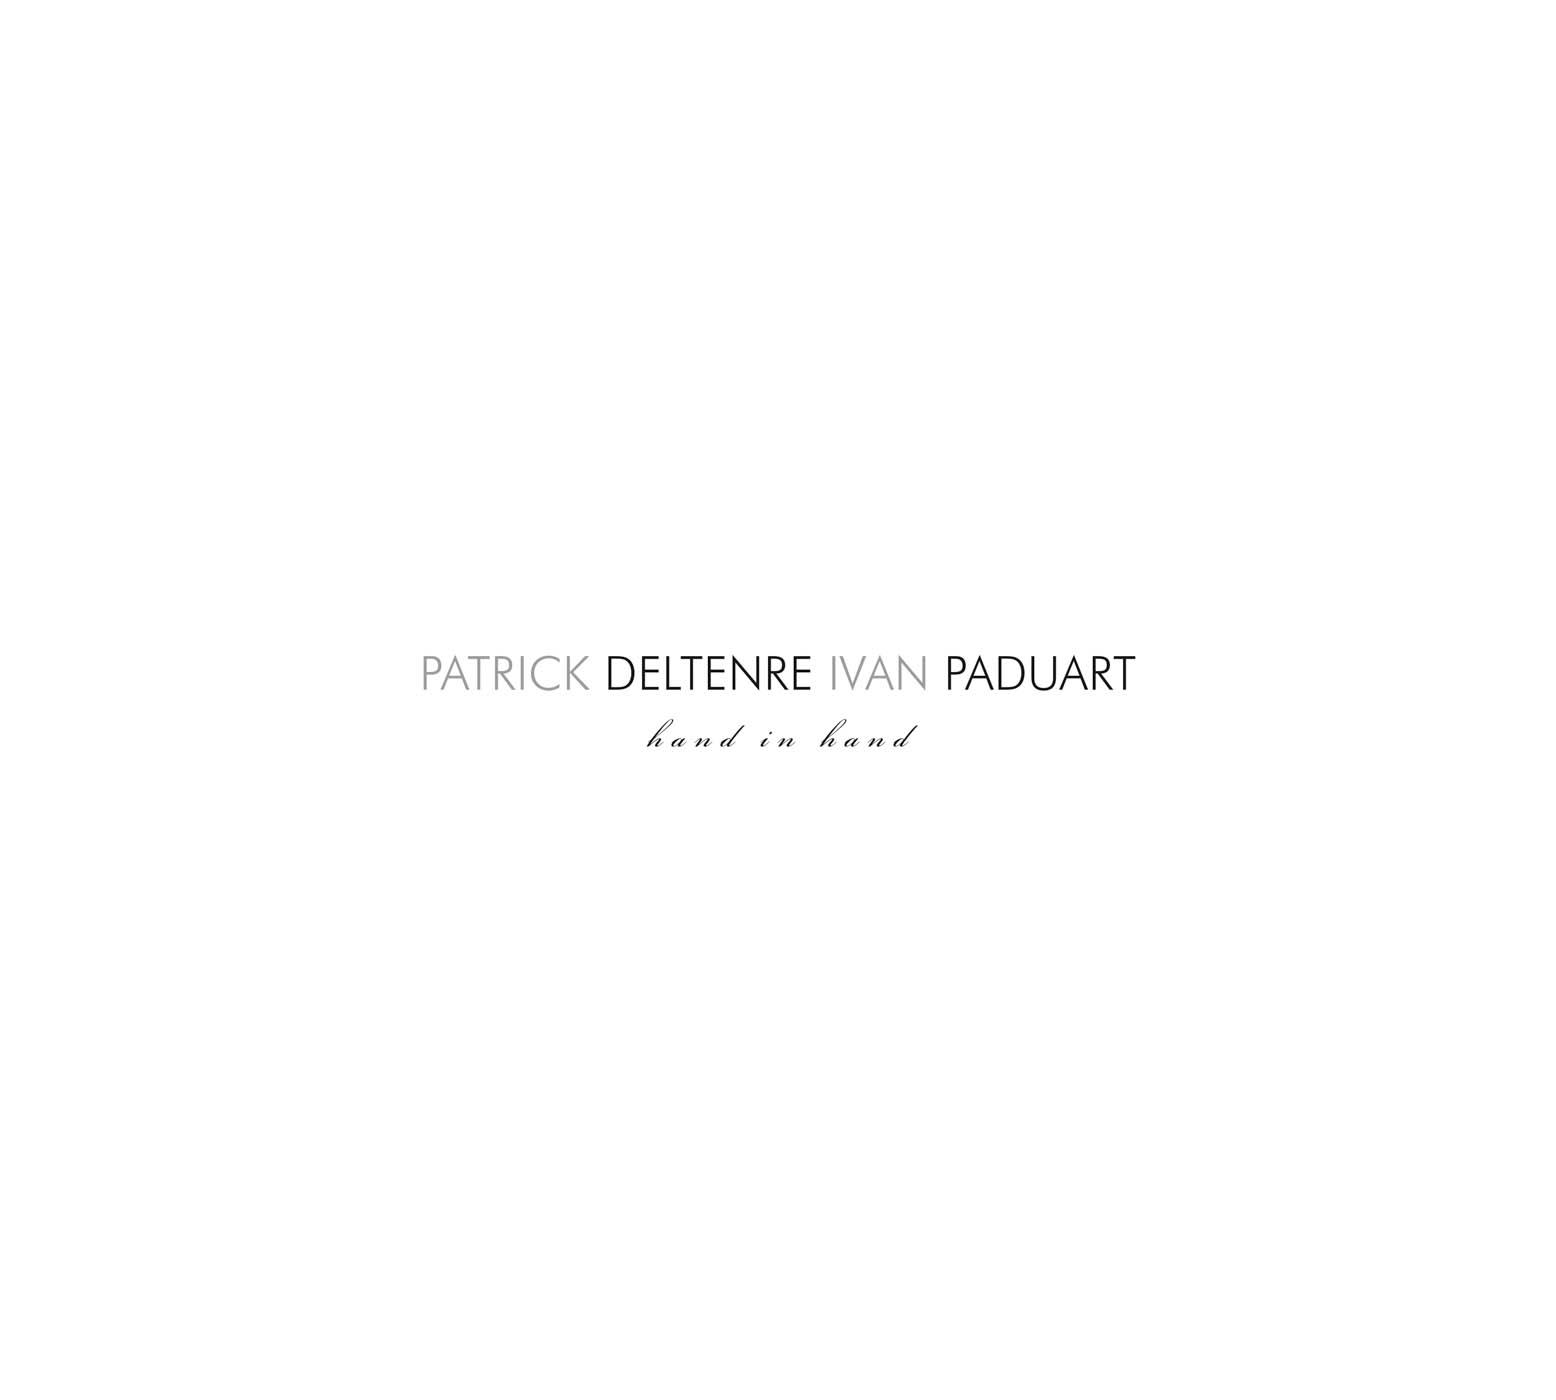 Patrick-Deltenre-Ivan-Paduart-Hand-in-Hand.jpg